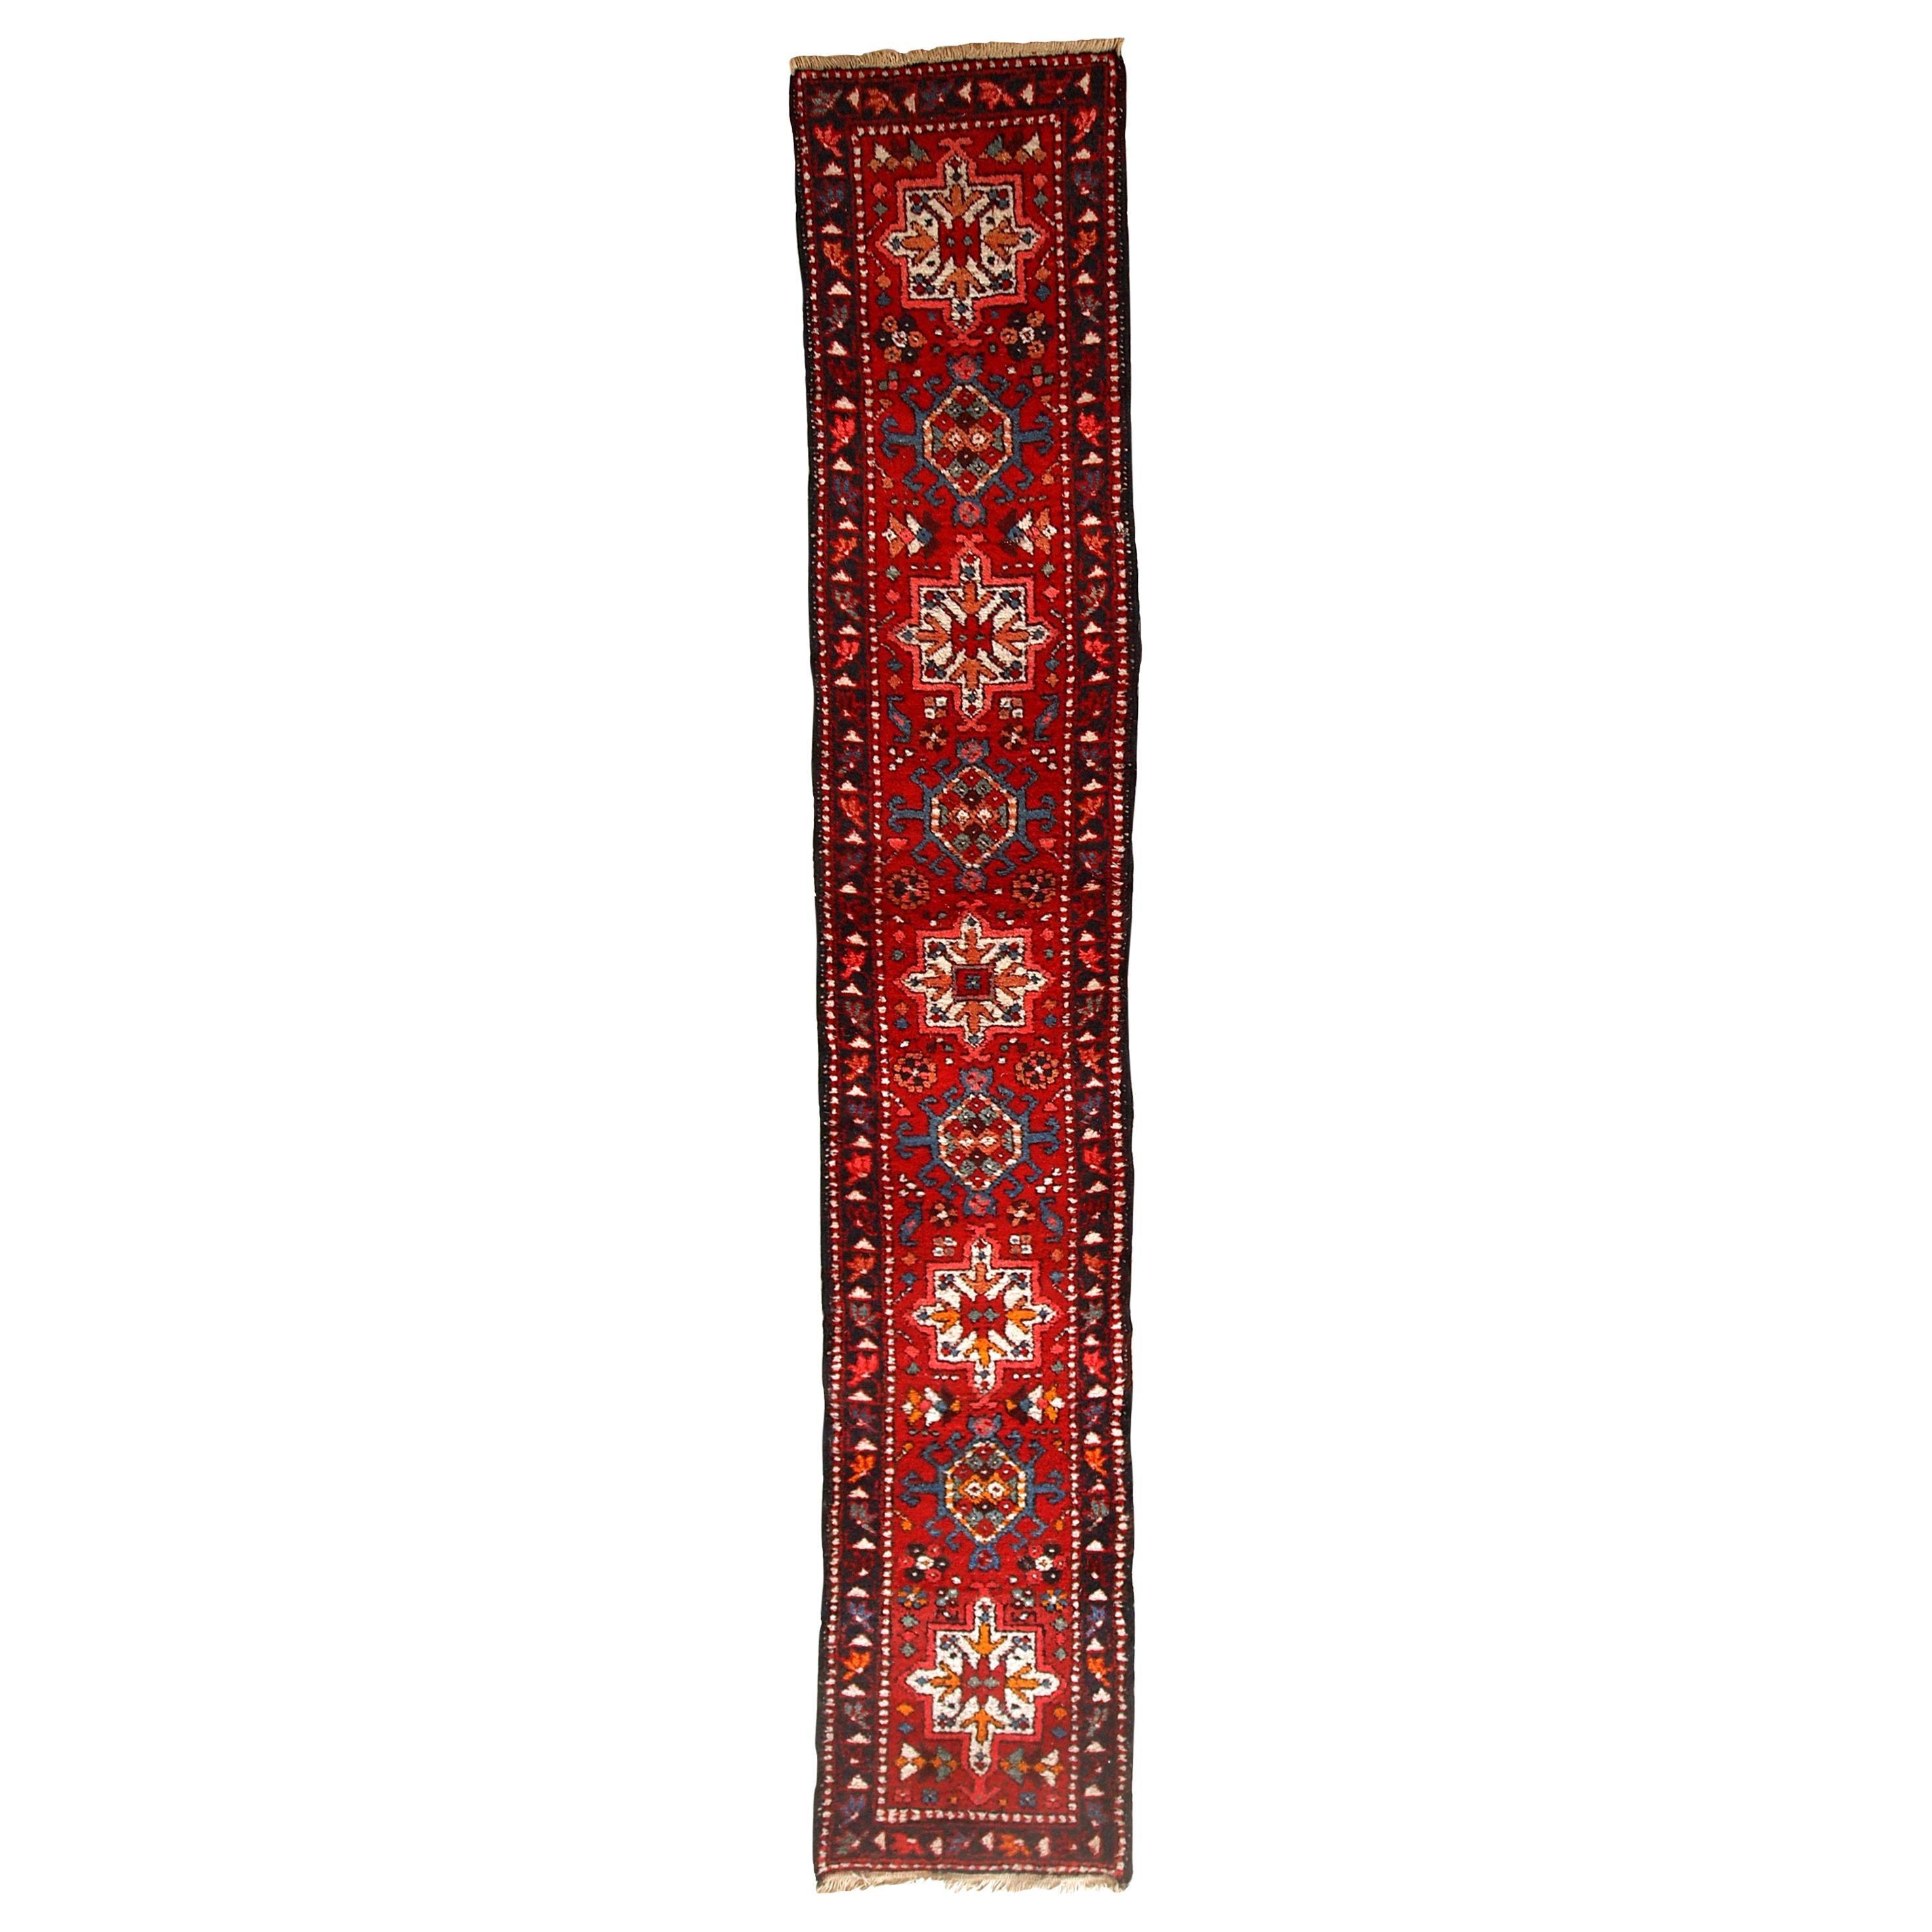 Handmade Vintage Karajeh Style Runner, 1960s, 1C686